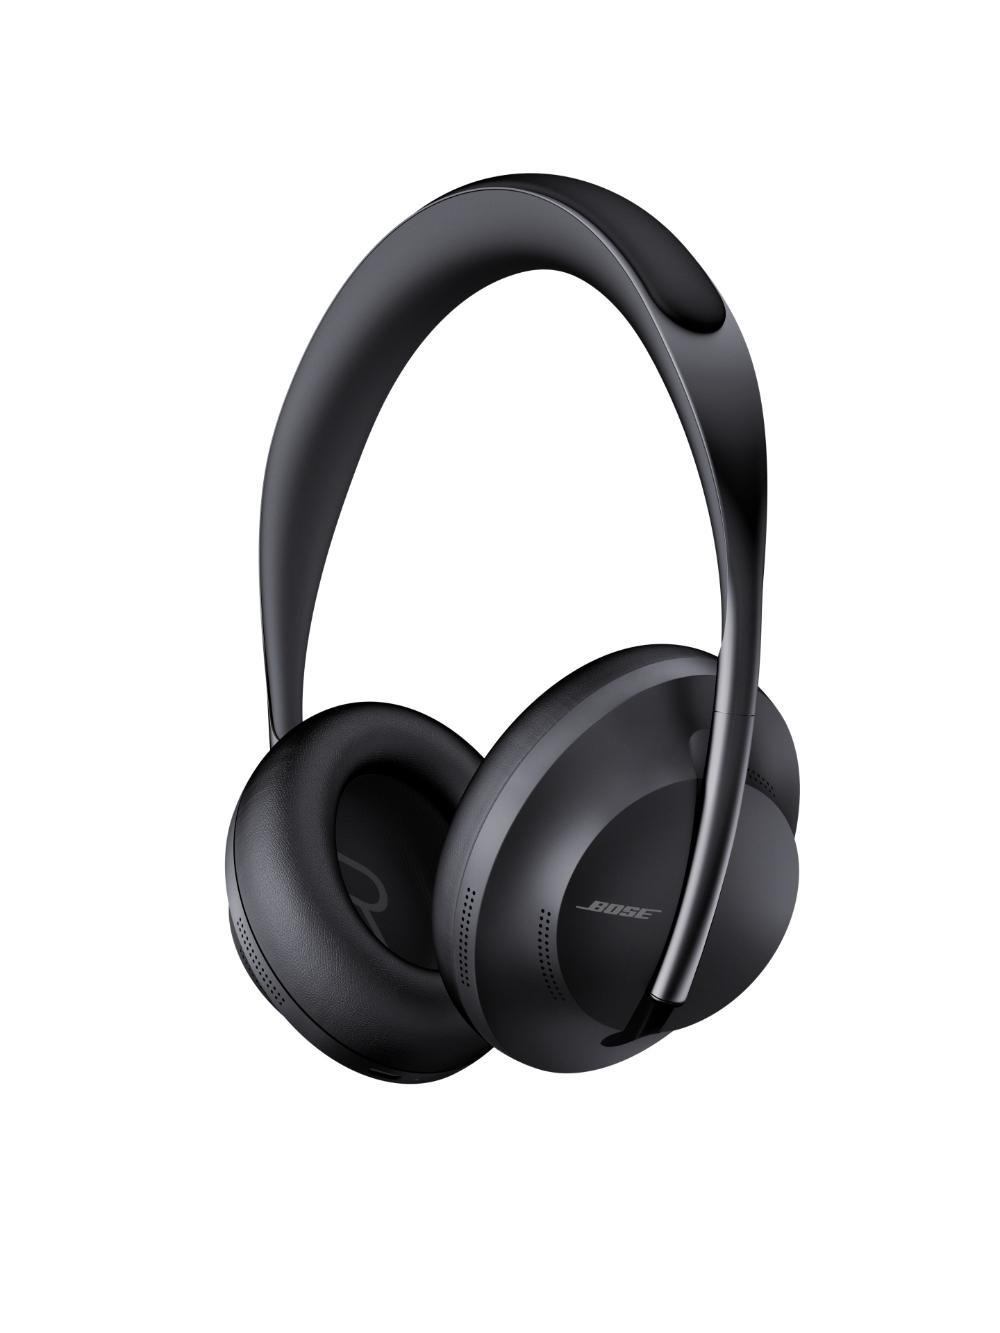 Bose Noise Cancelling Wireless Bluetooth Headphones 700 In Black Walmart Com Bose Headphones Bose Noise Cancelling Noise Cancelling